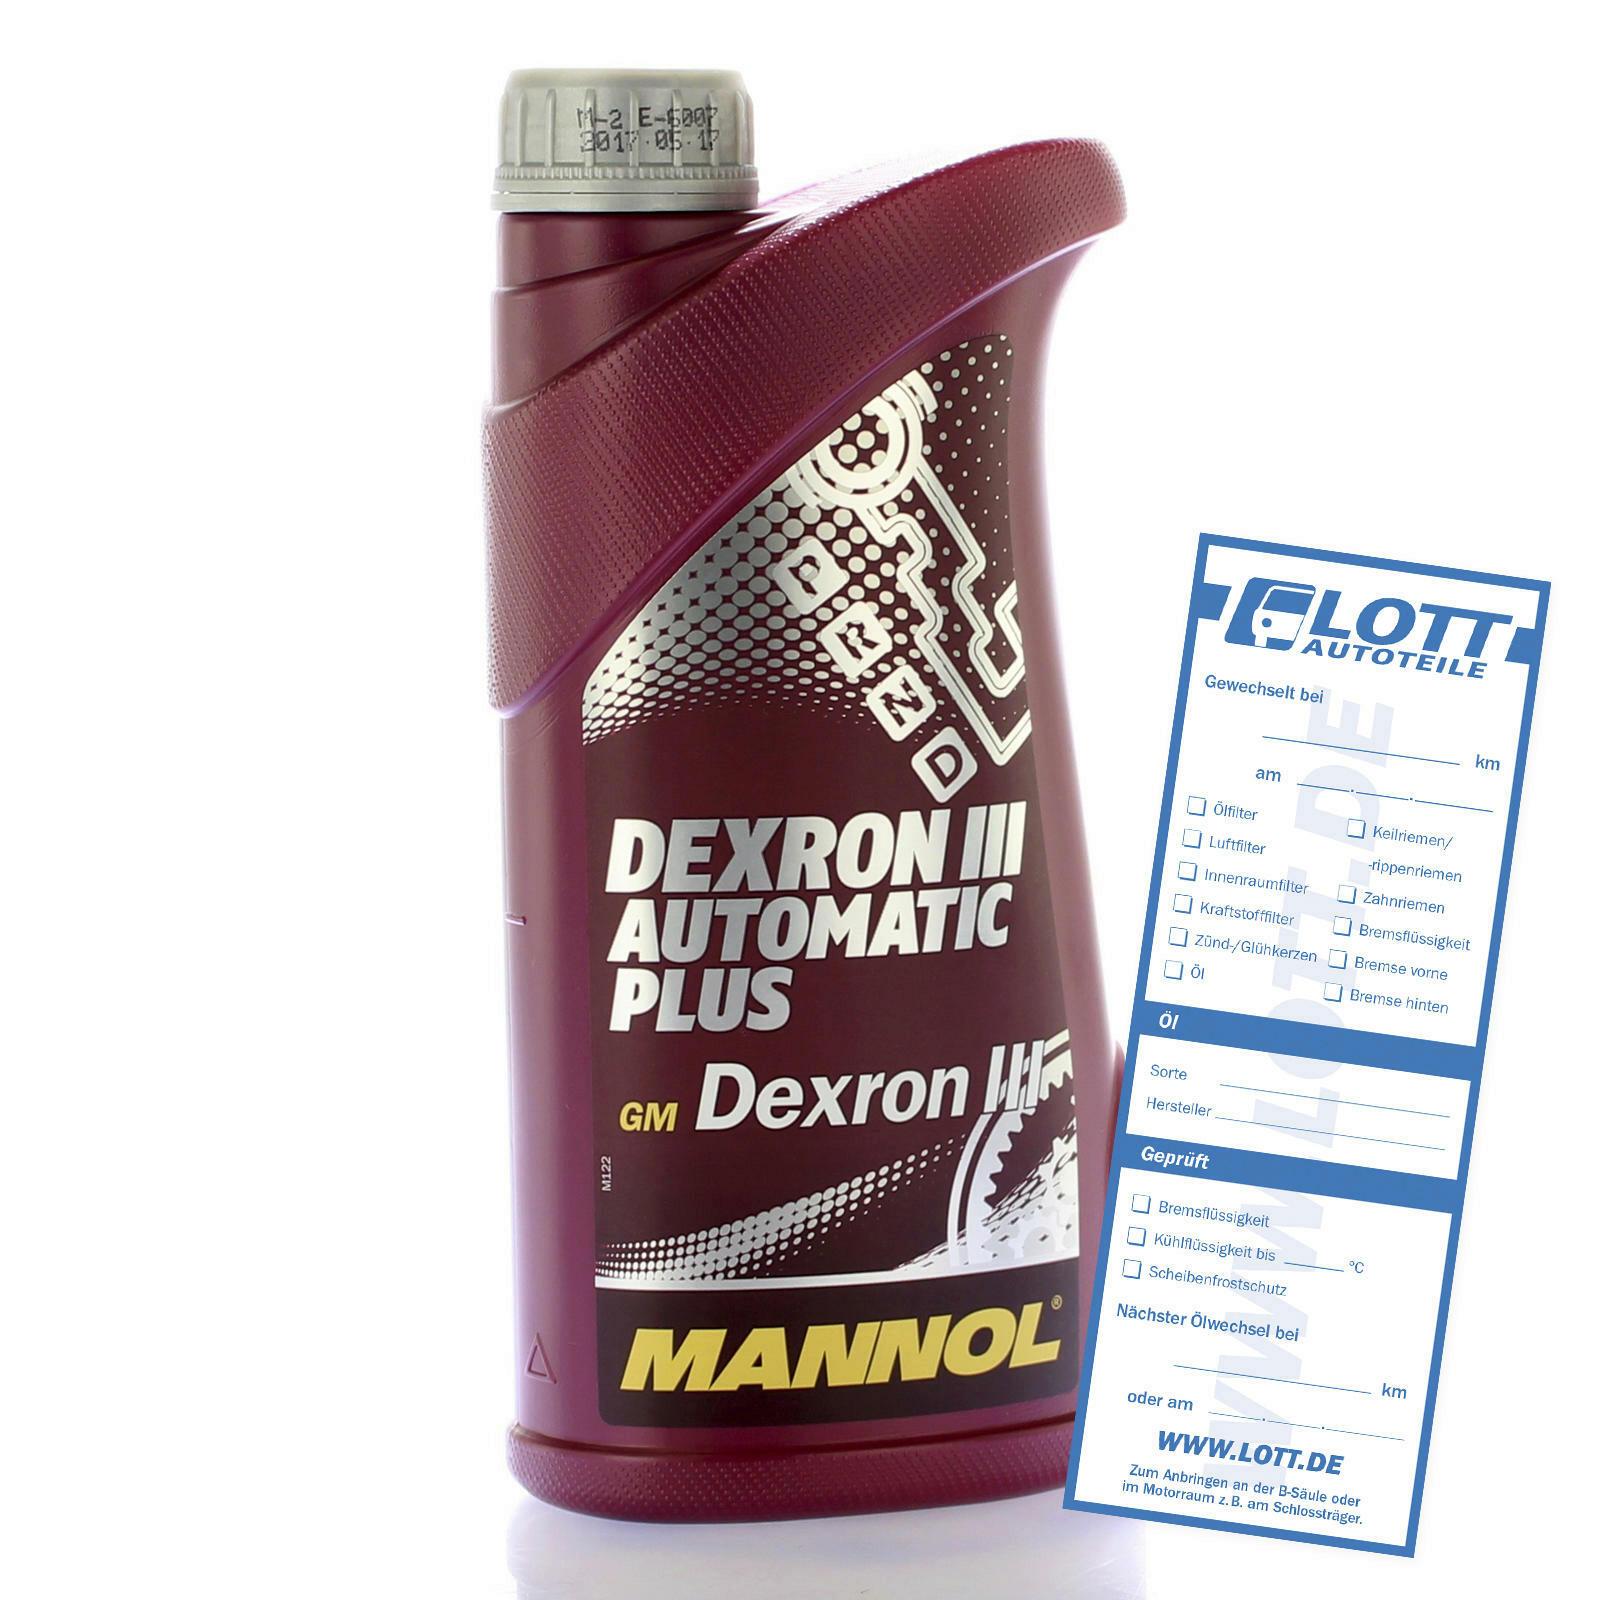 Mannol Automatikgetriebeöl Dexron 3 1L